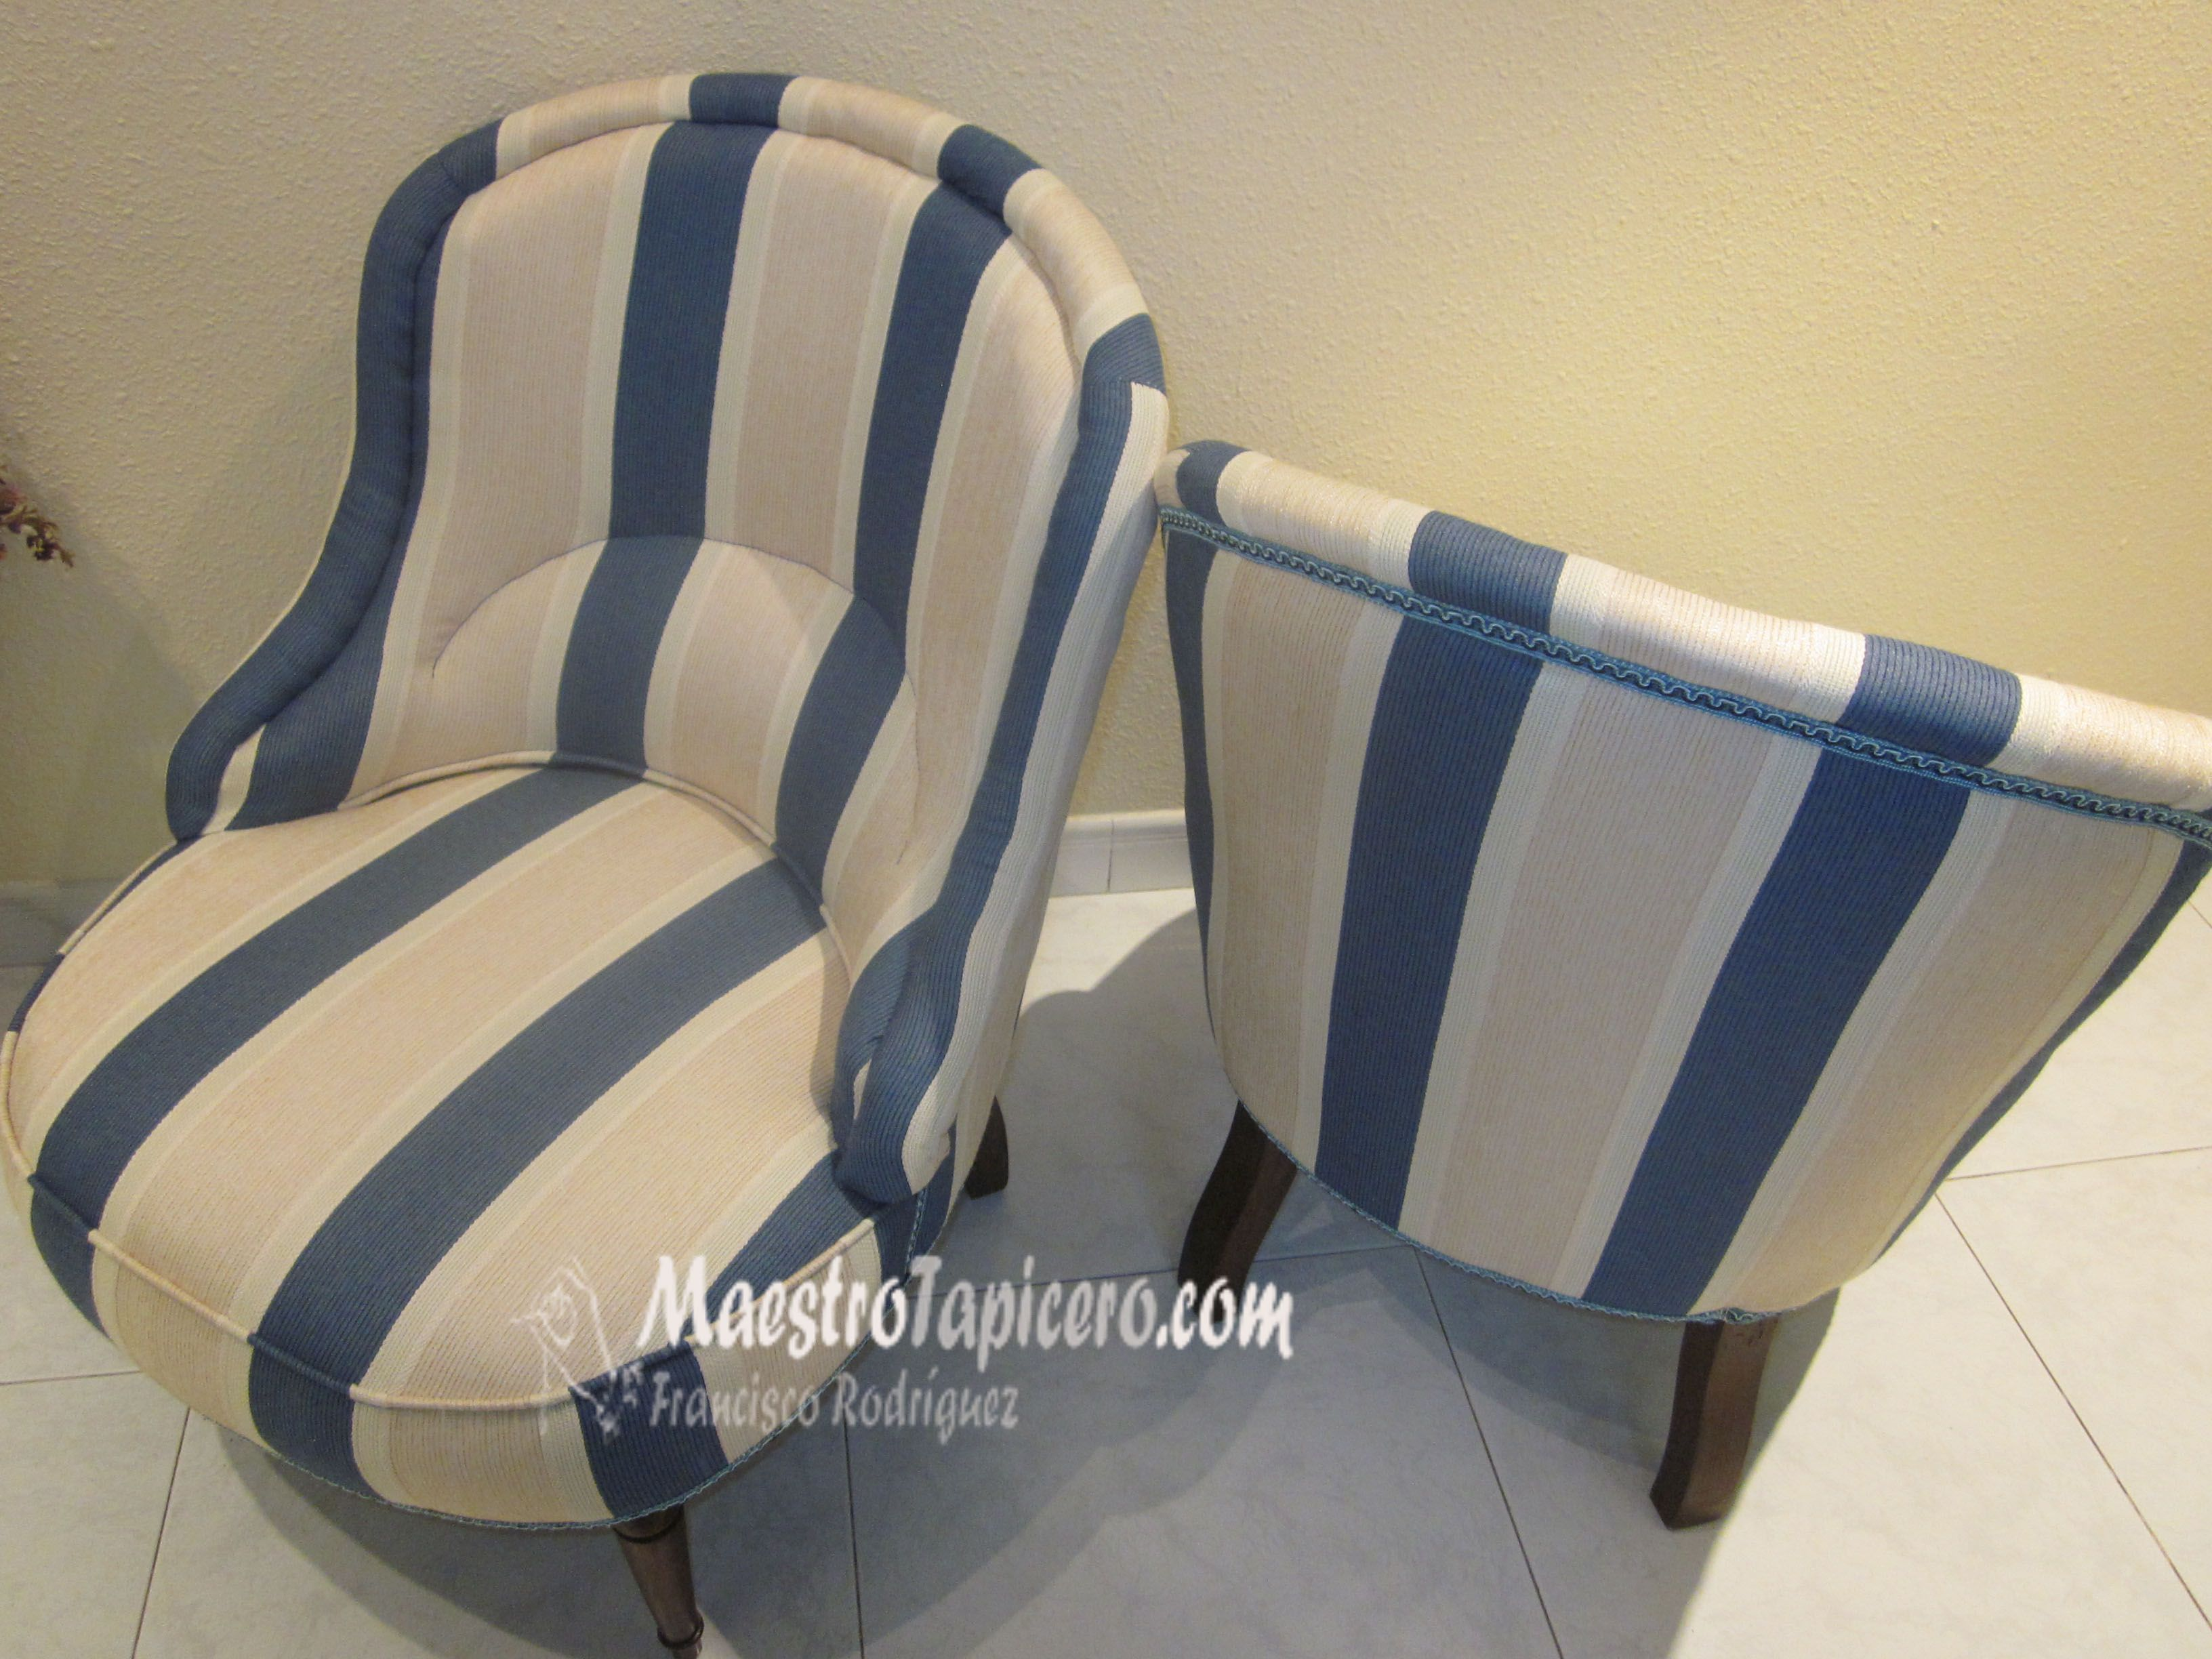 Butaca descalzadora tapizada a rayas 3264 2448 cosas de marisol pinterest cosas - Como tapizar una descalzadora ...